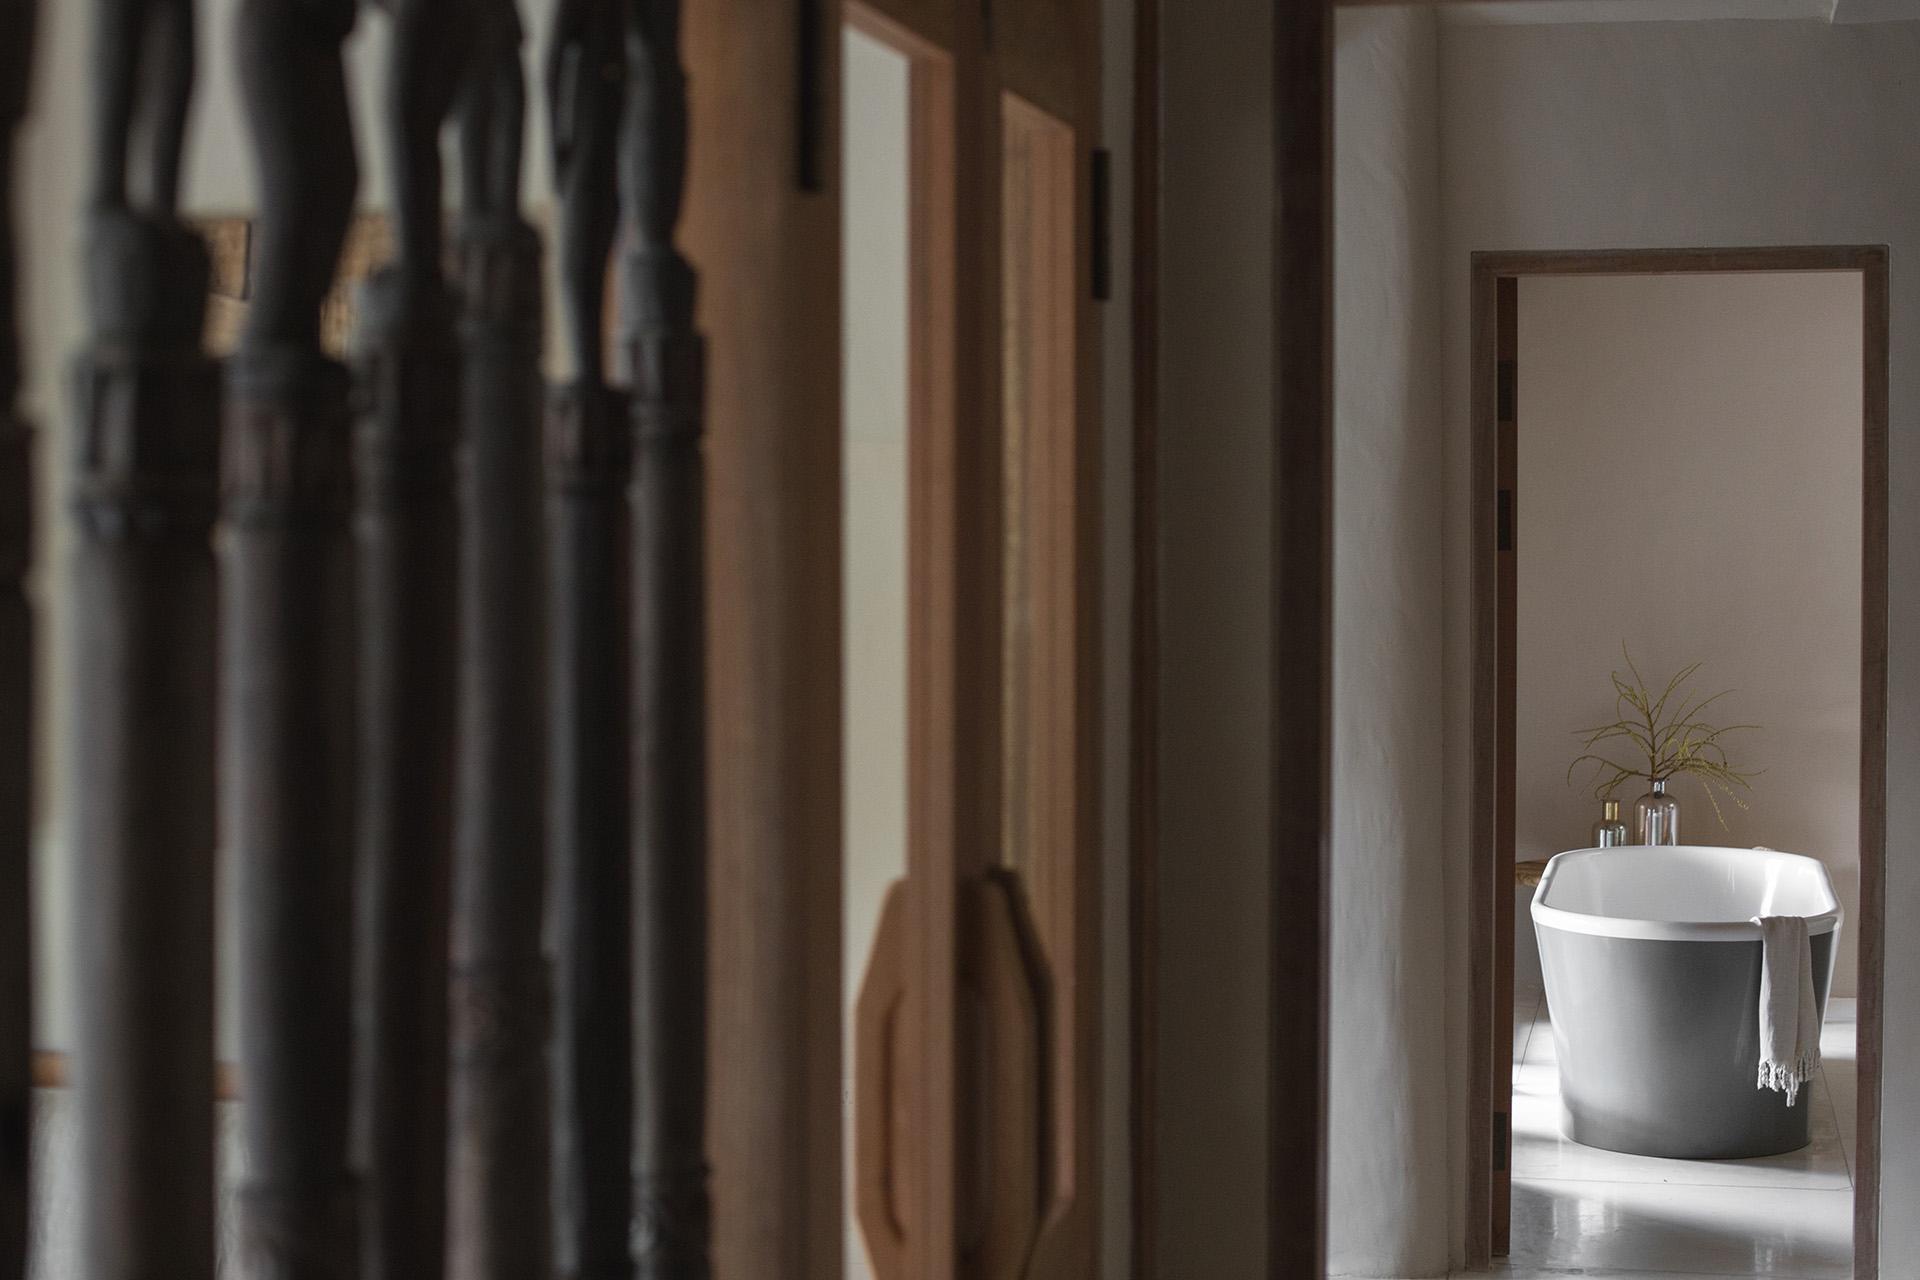 The Meier bedroom. Photo by Jencquel Tommaso Riva. Styling byLisa Scapin.